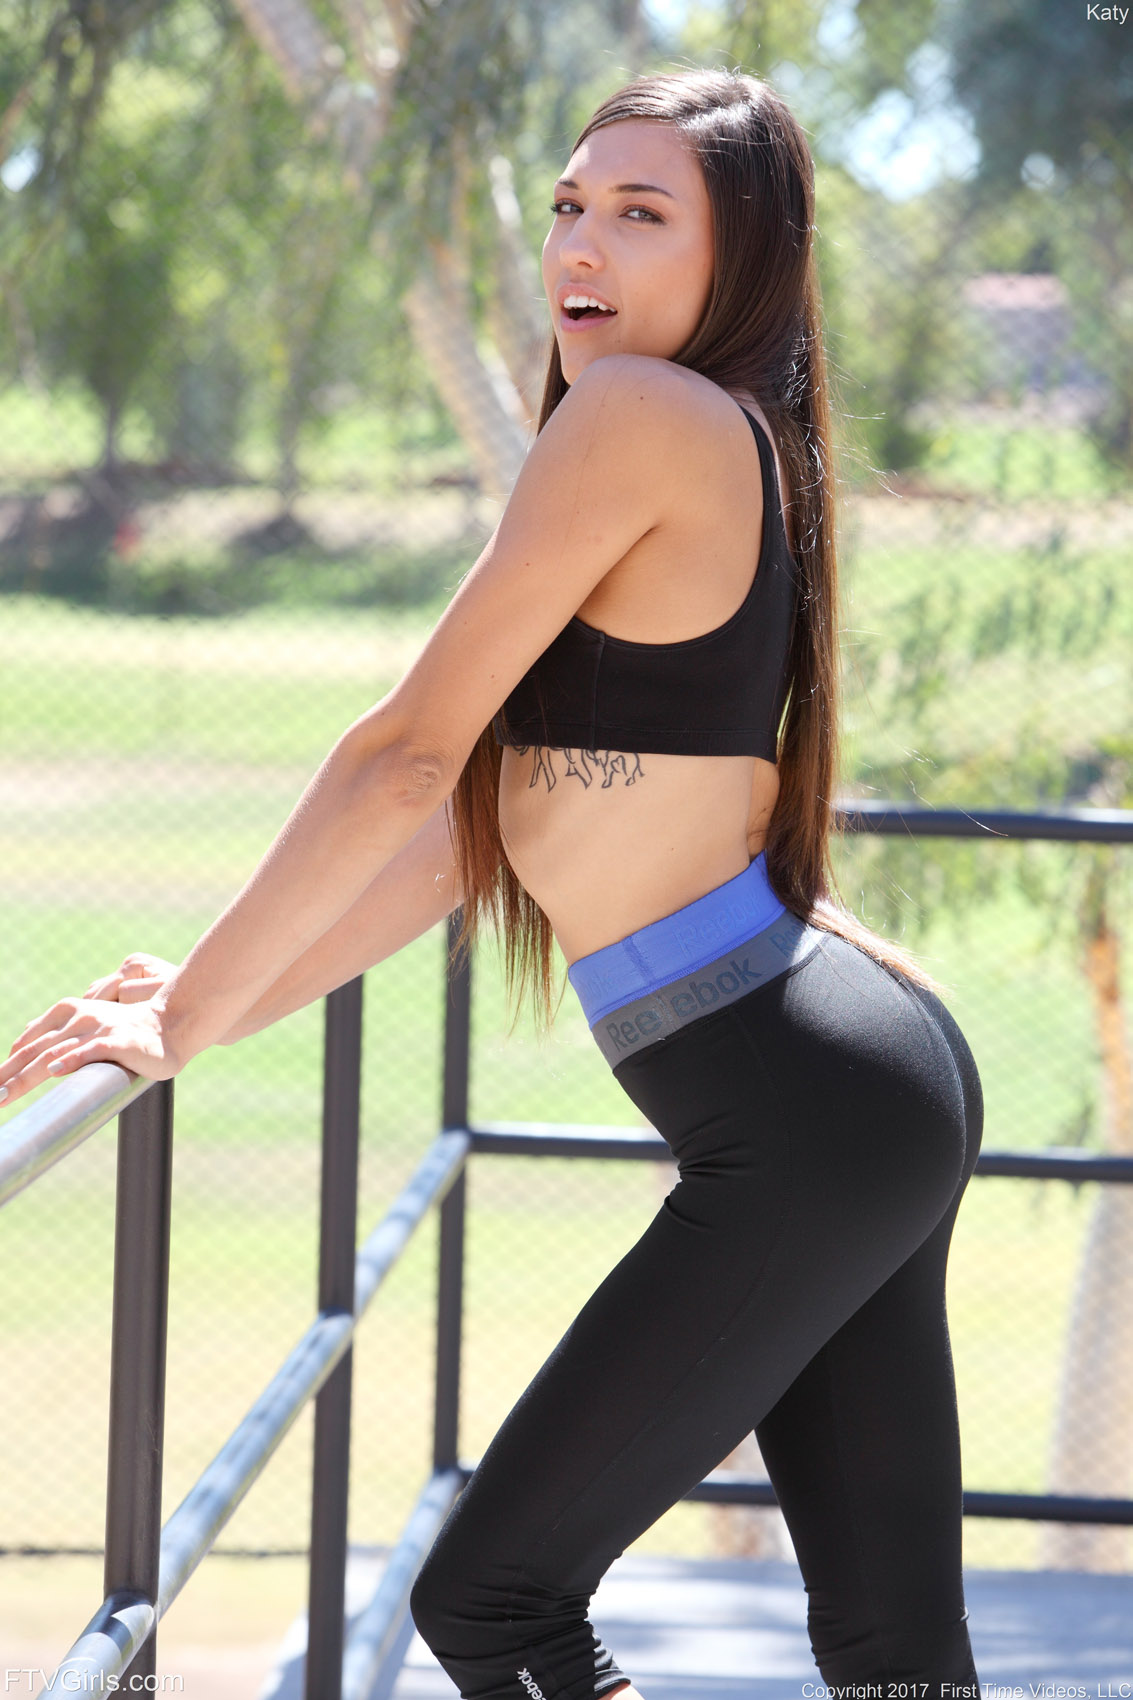 ftv sport pussy ... Katy FTV Girls Sporty Look